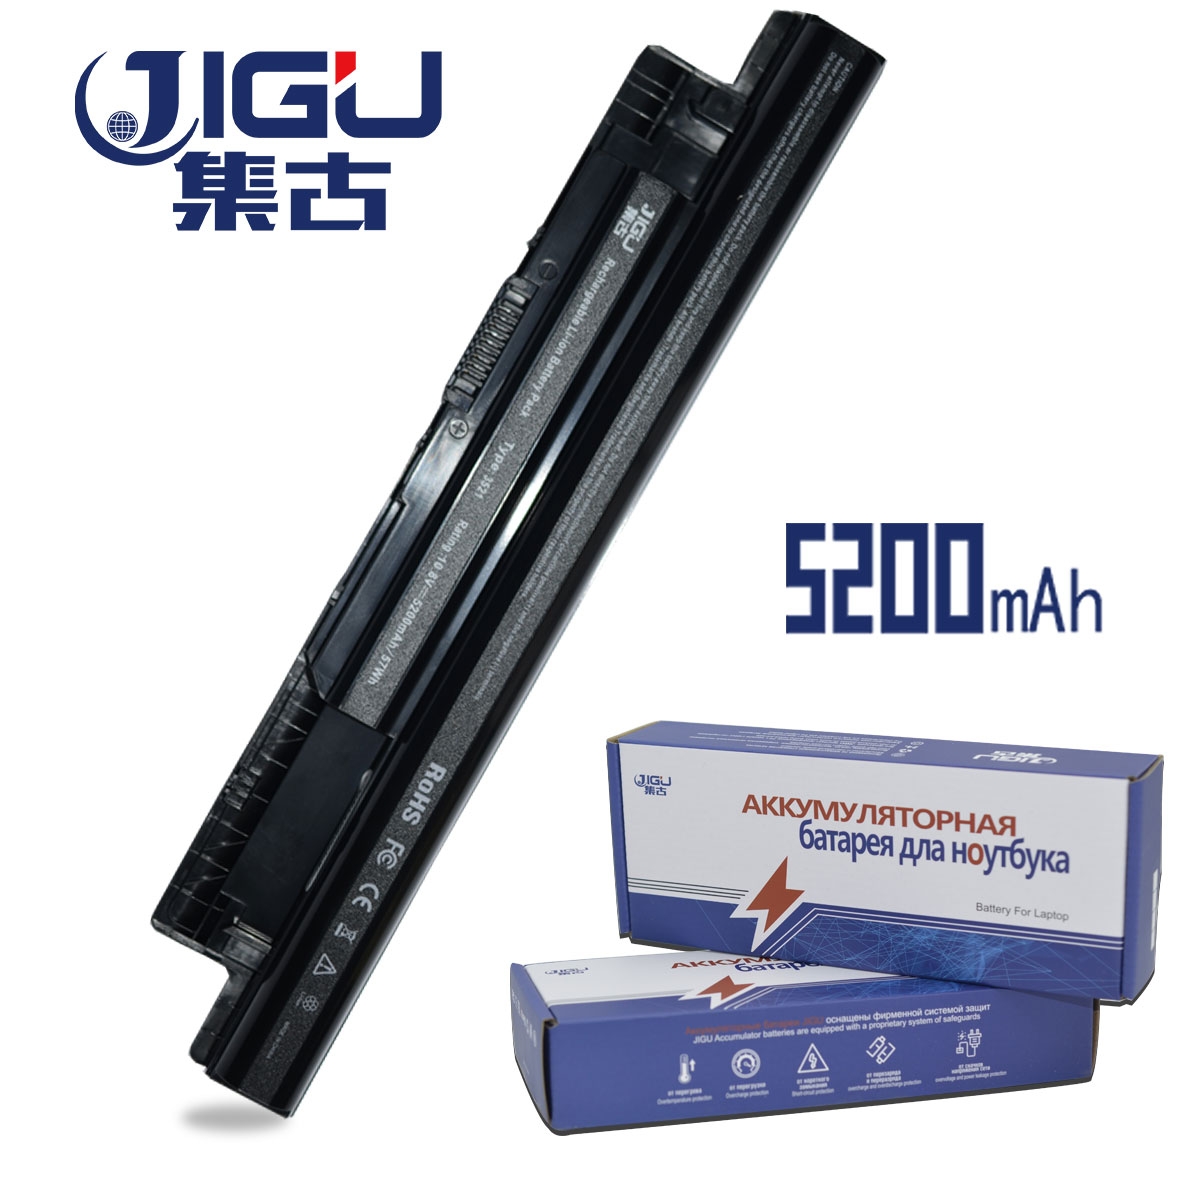 JIGU Laptop Battery For Dell Inspiron 15R 3521 N3521 5521 N5521 VR7HM V1YJ7 V8VNT PVJ7J G019Y MK1R0 9K1VP XCMRD